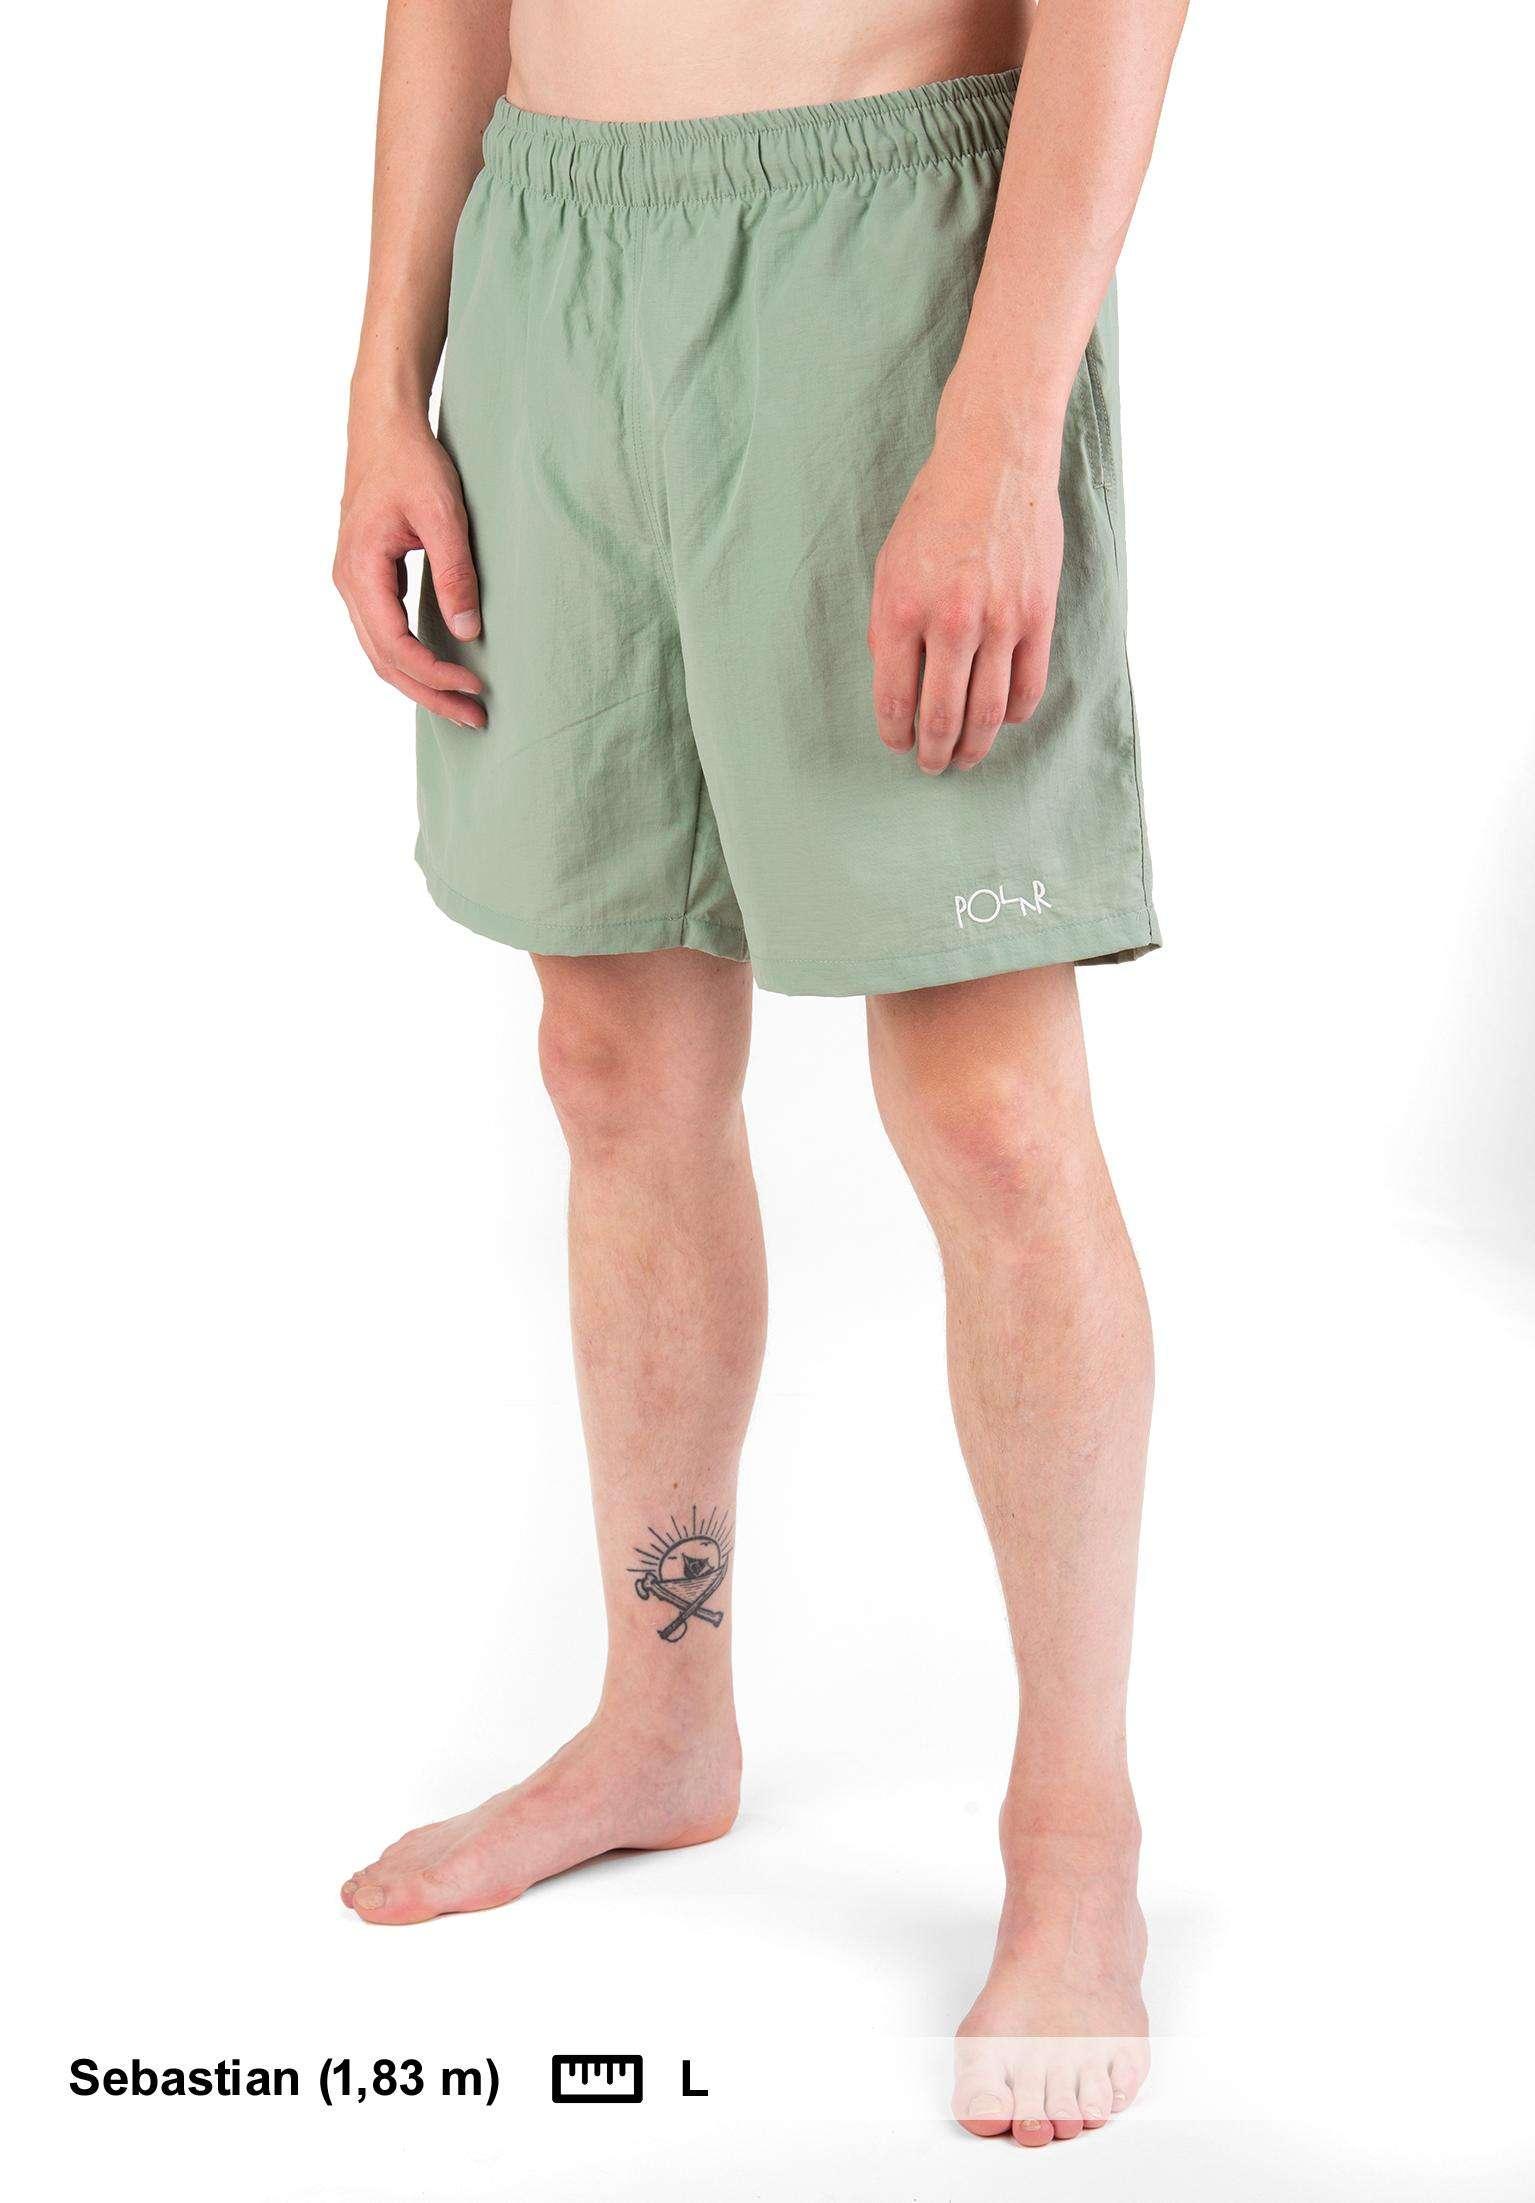 f6407c2872d1d Swim Shorts Polar Skate Co Beachwear in seafoamgreen for Men | Titus